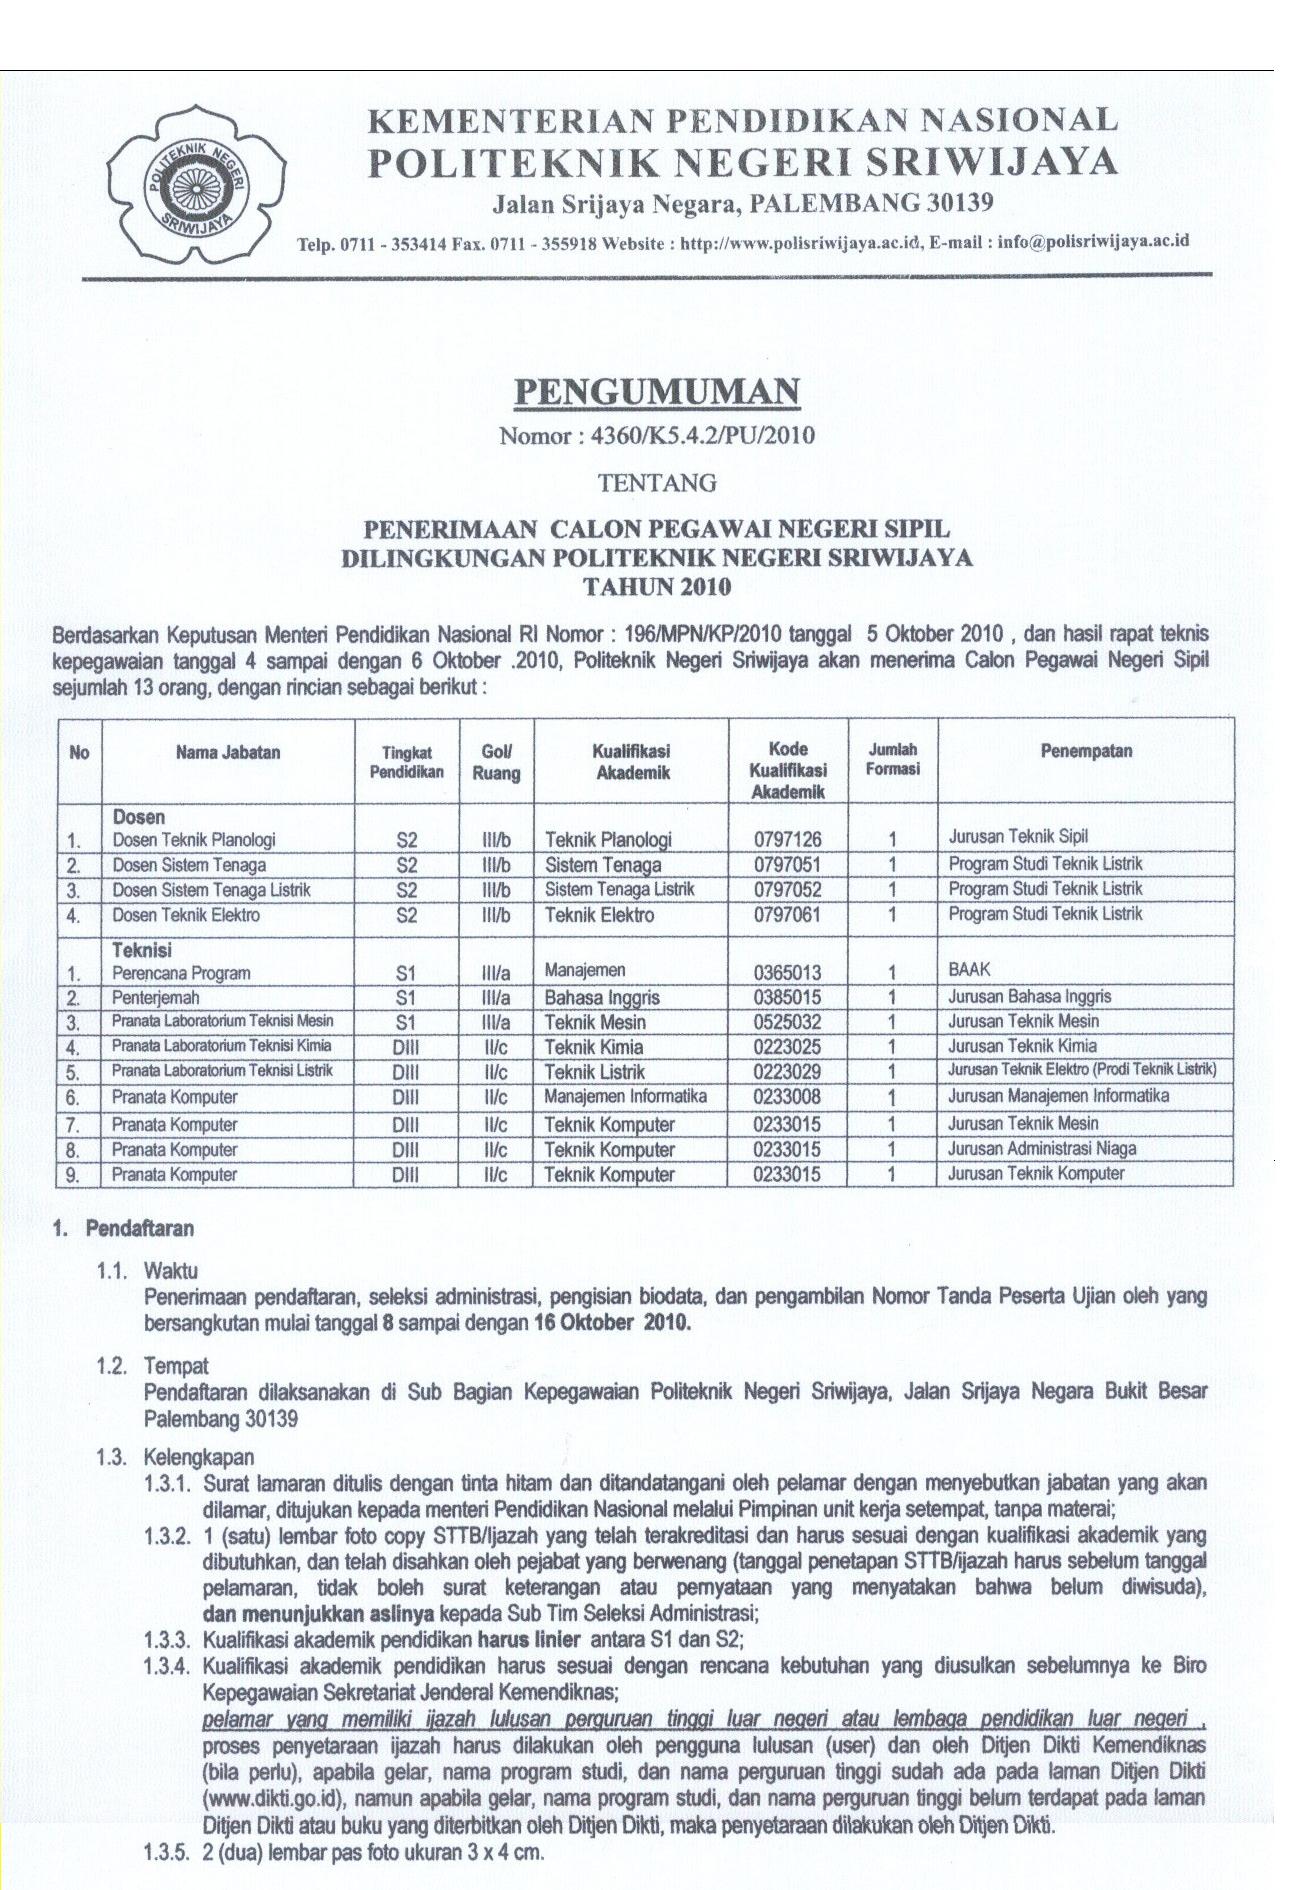 Penerimaan CPNS Politeknik Negeri Sriwijaya Tahun 2010